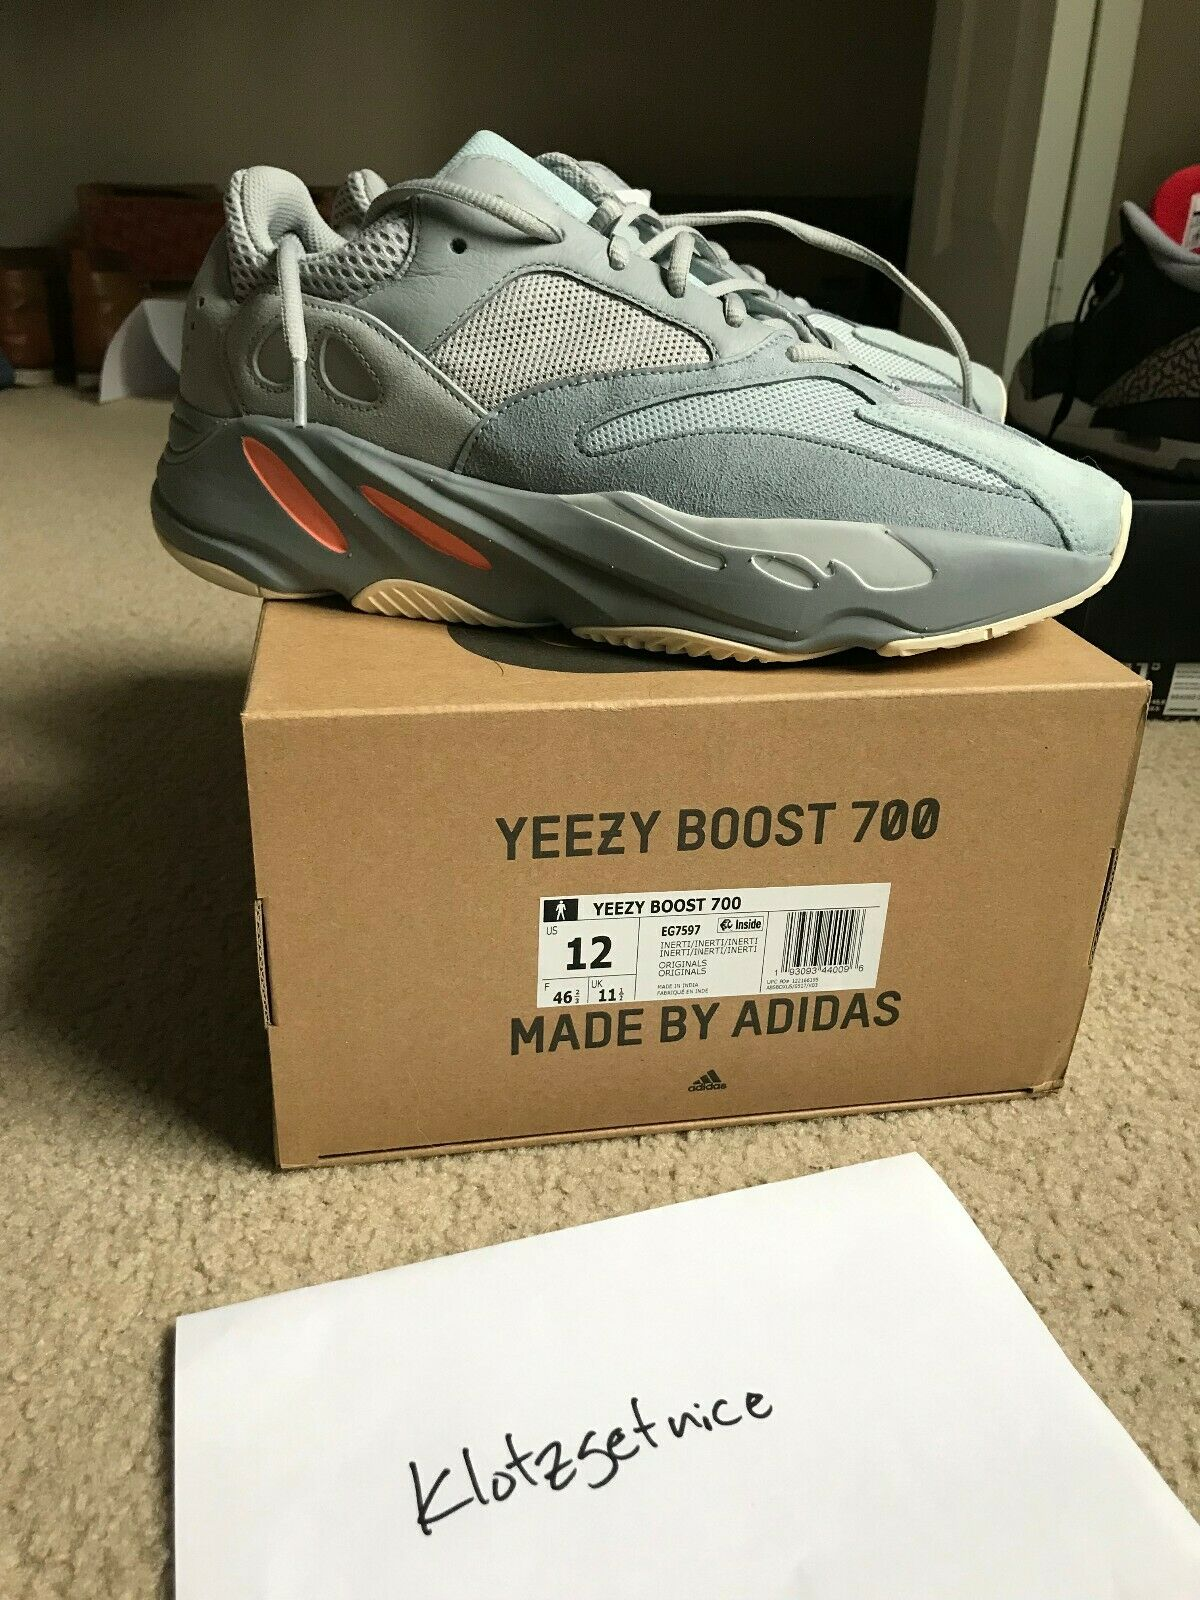 Adidas Yeezy Boost 700 Inertia Size 12 Men's NEVER WORN BRAND NEW